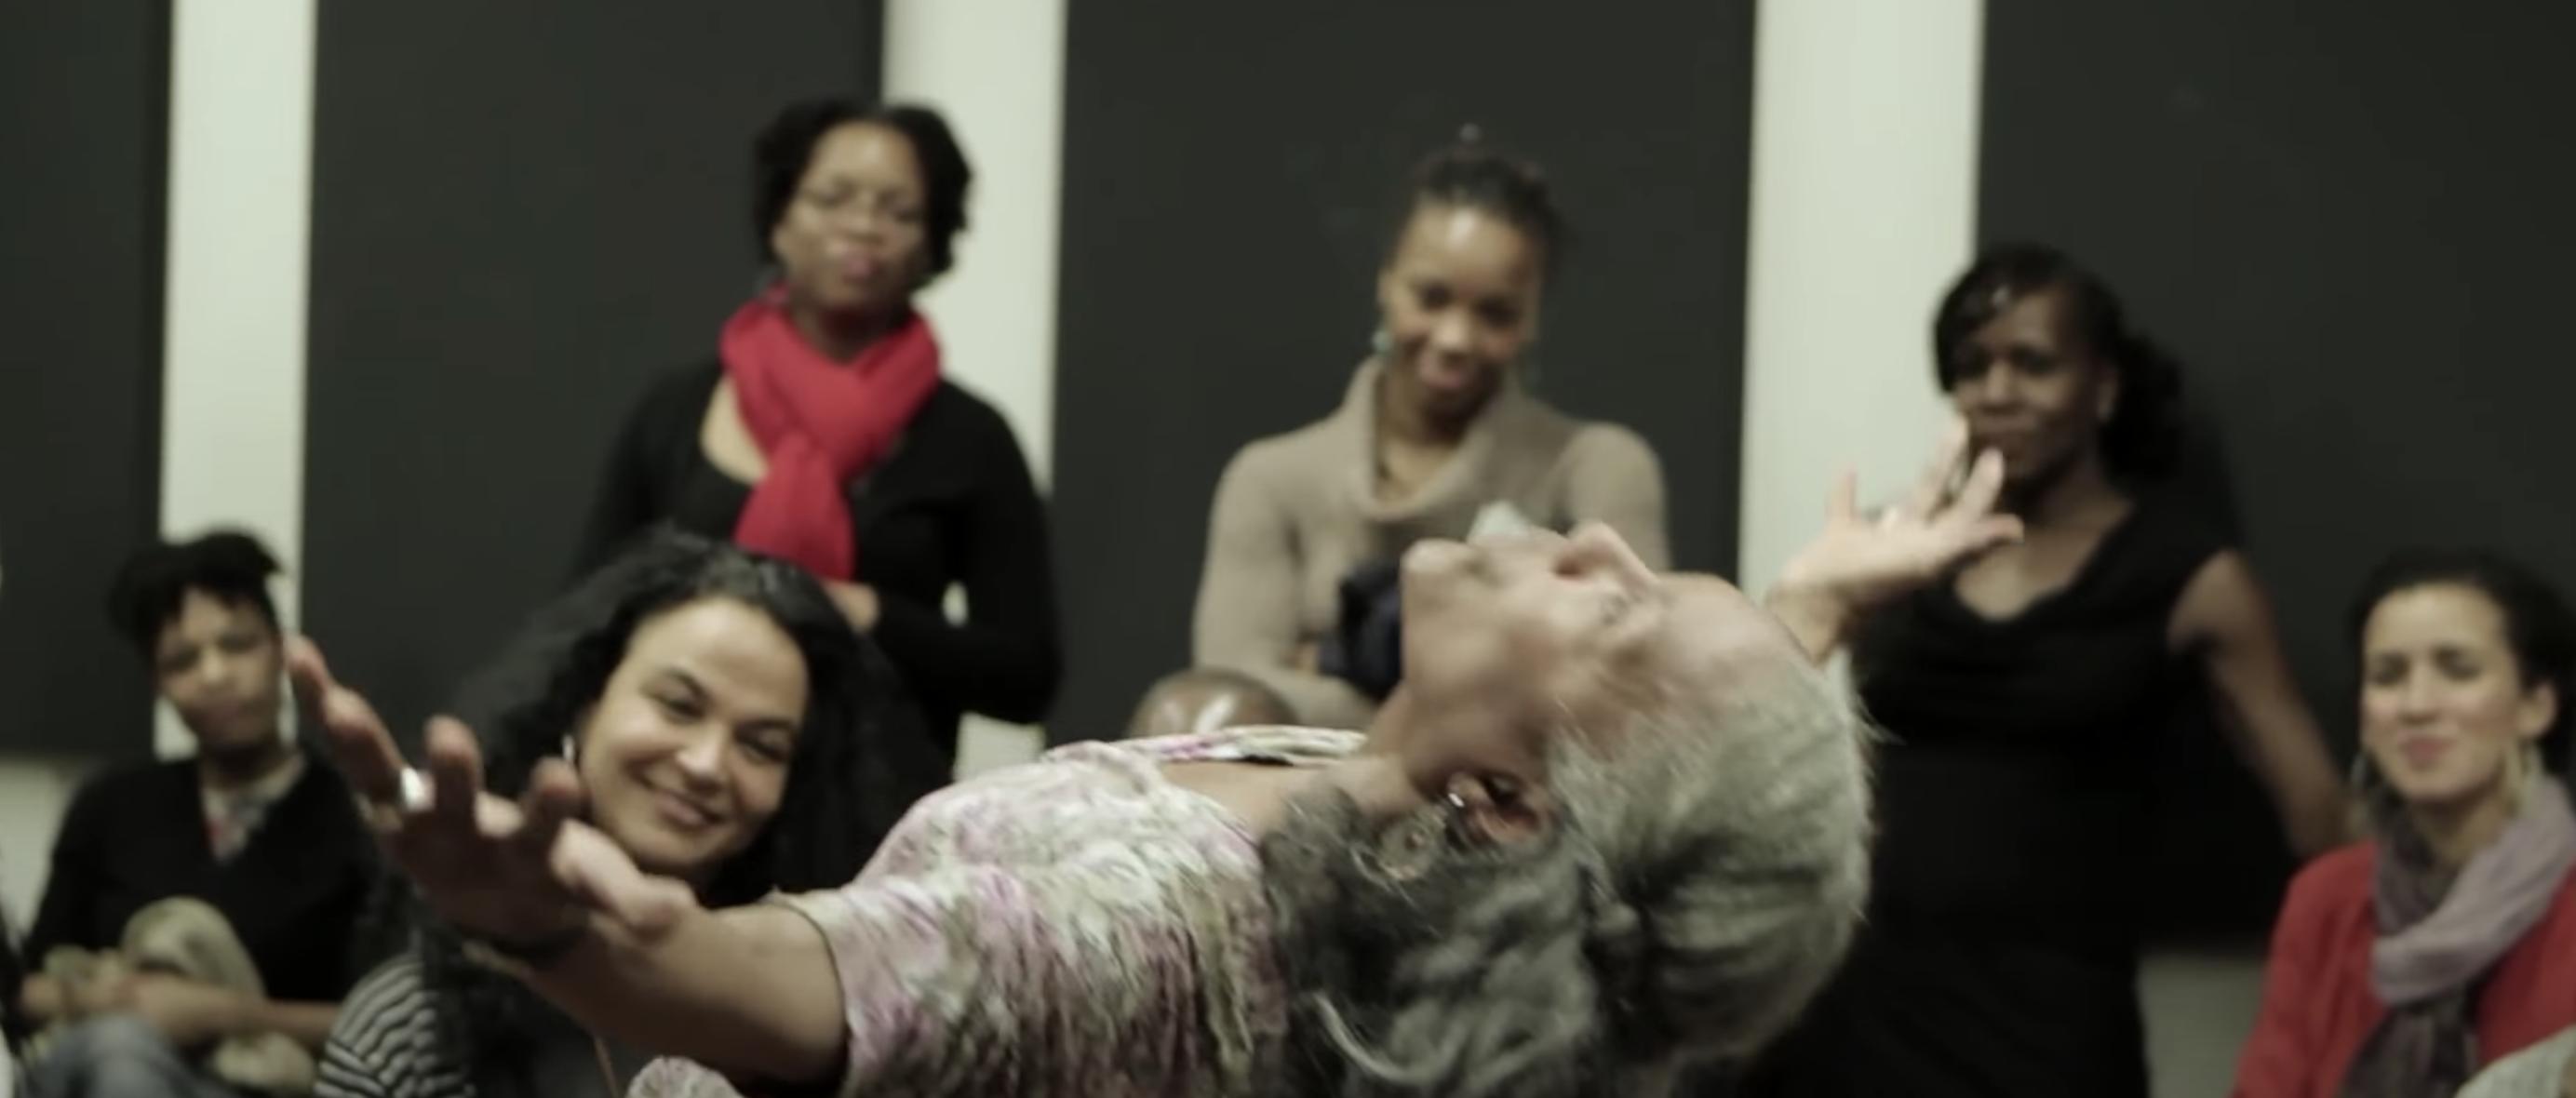 Dr. Brenda Dixon-Gottschild tells her Dancing While Black story